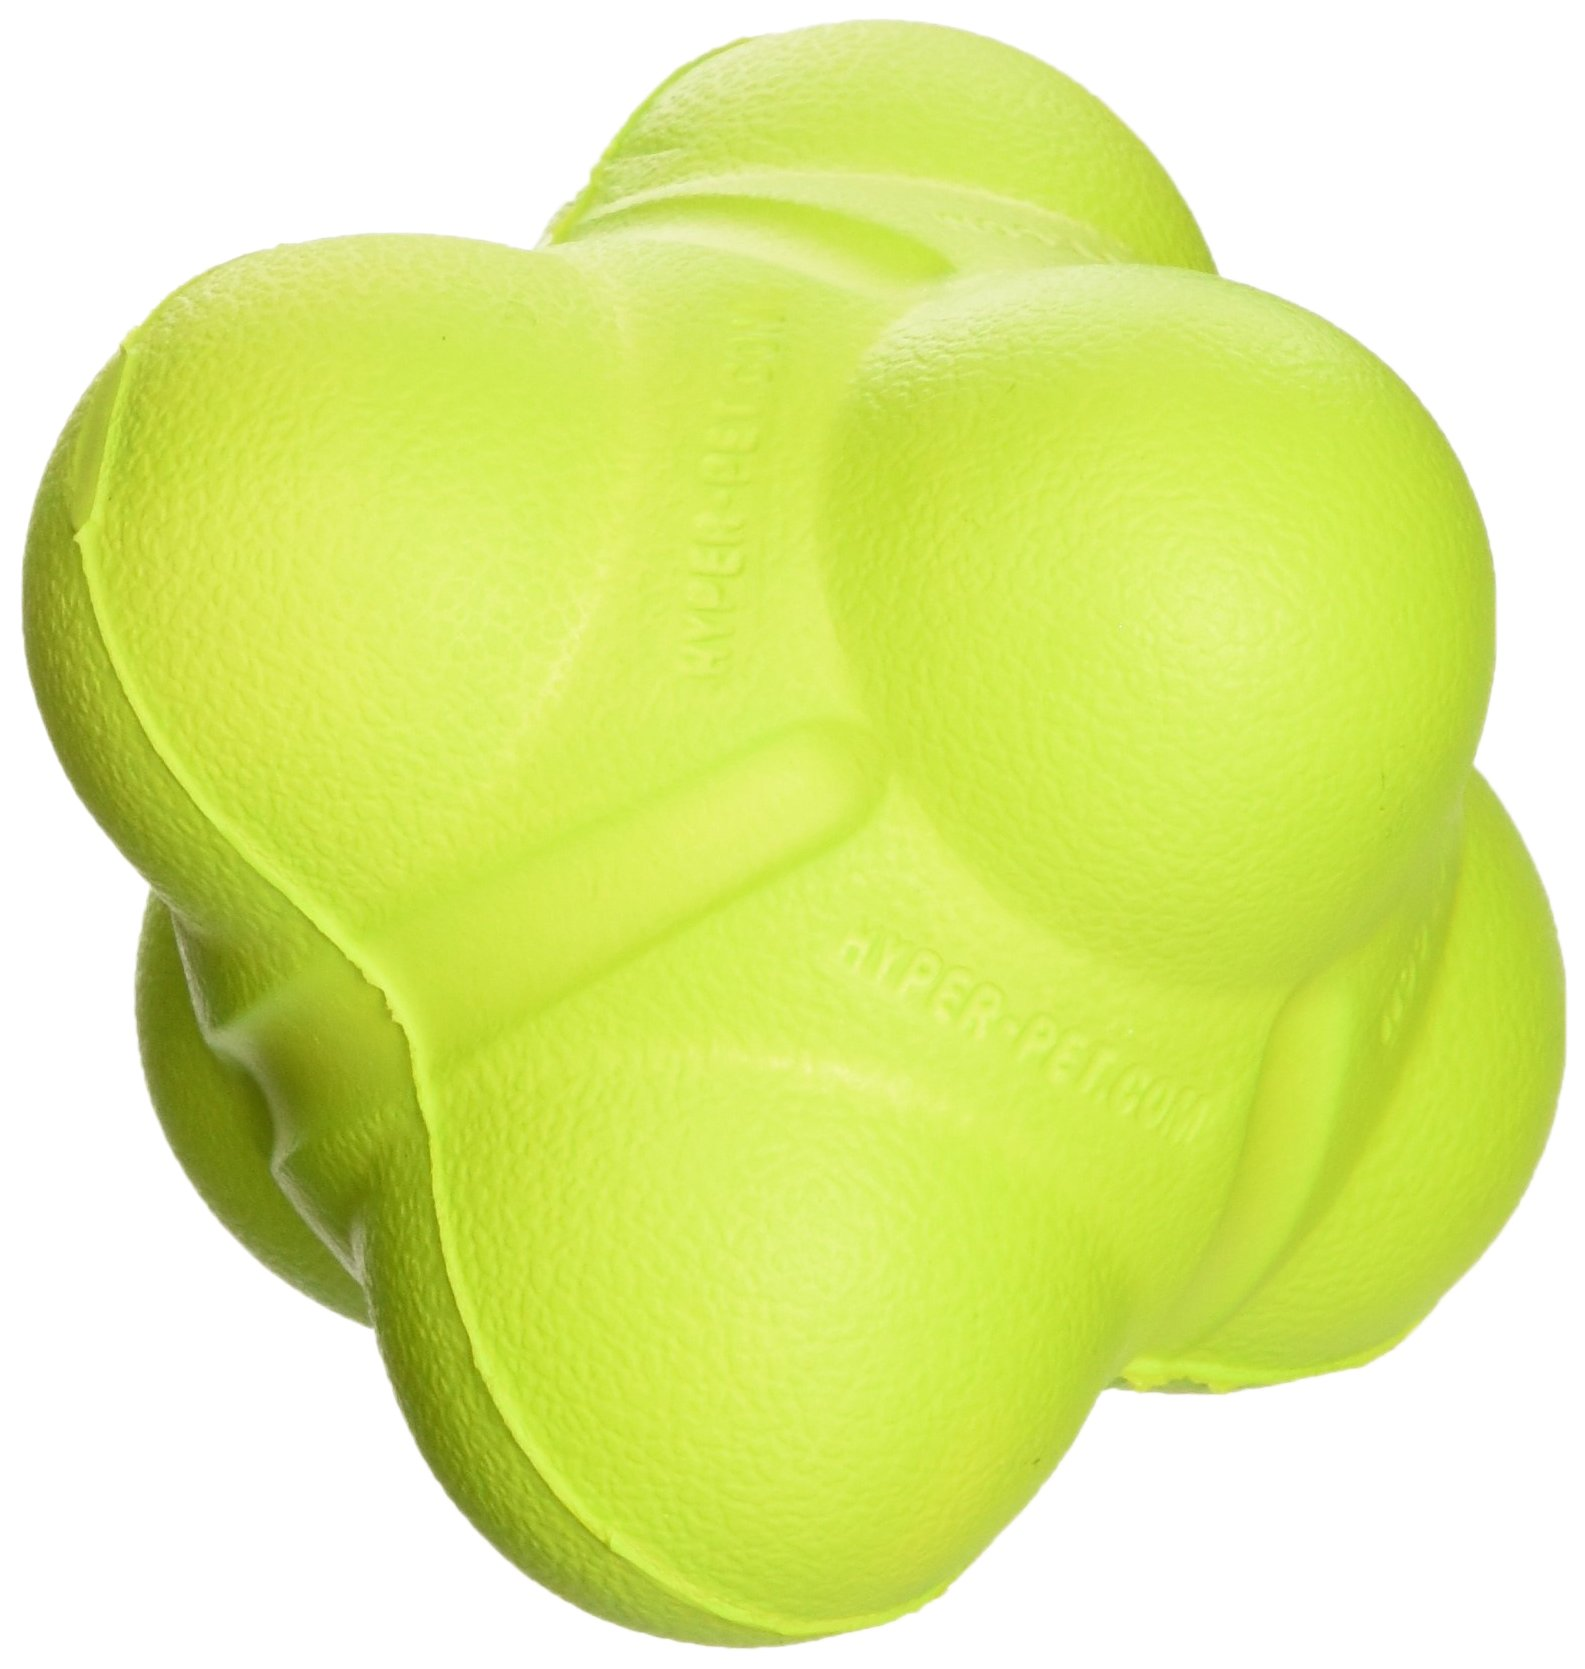 Hyper Pet Chewz Bumby Ball Dog Toy 4